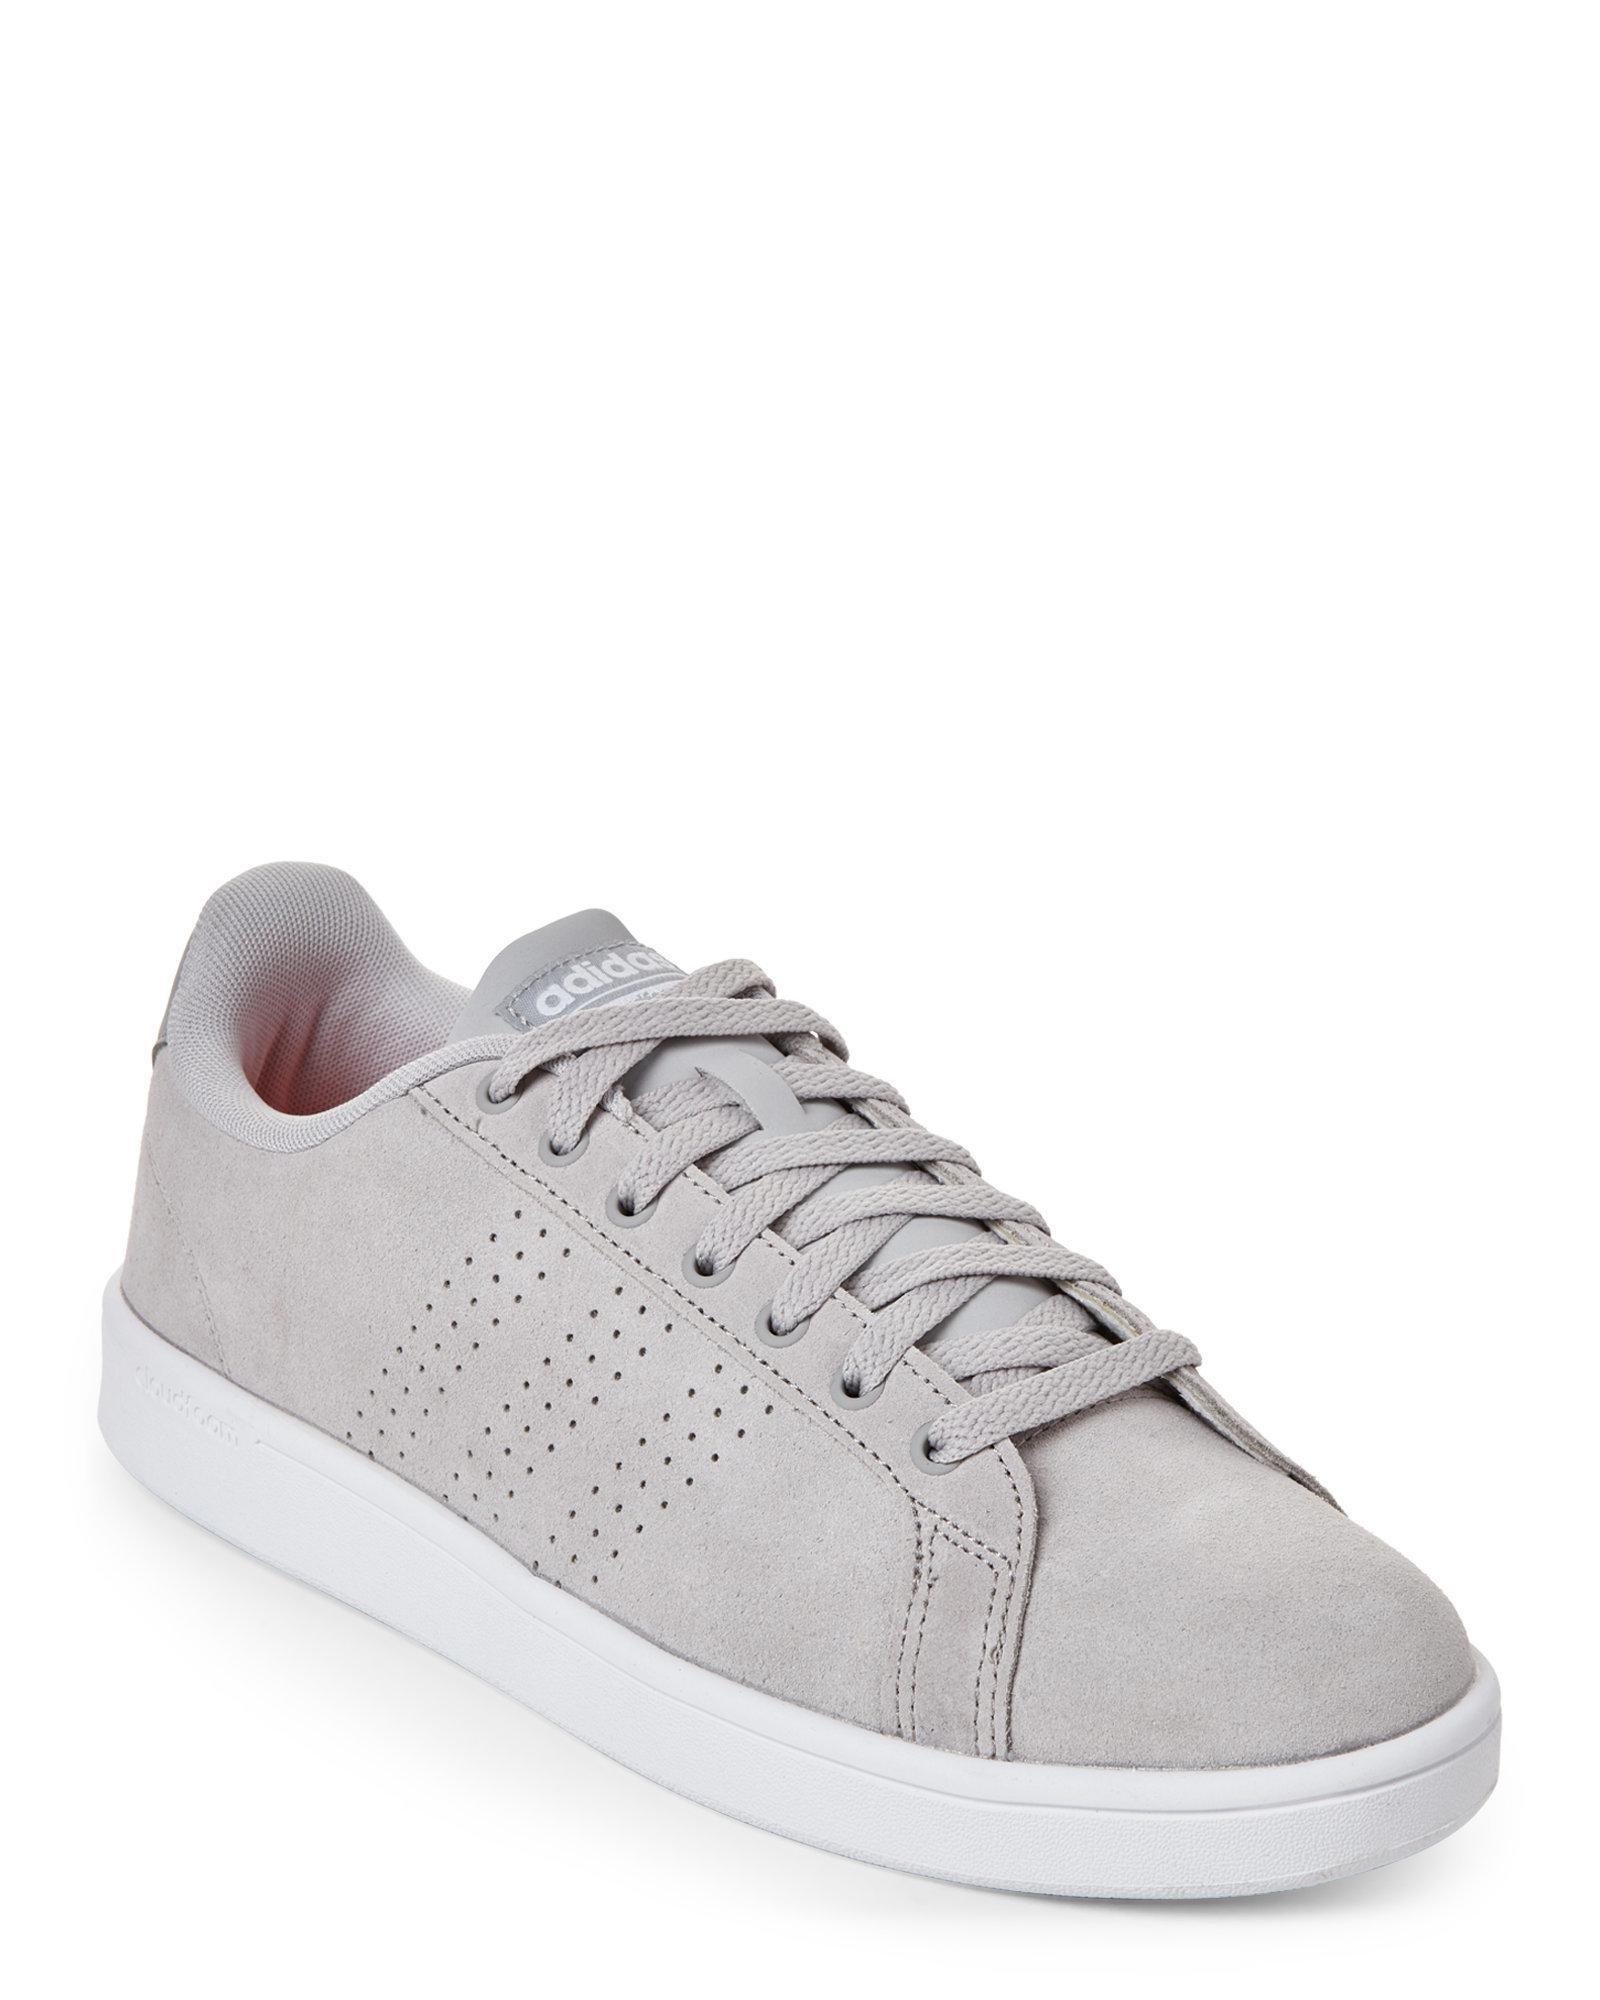 White amp; Low Clean Adidas Cloudfoam Top Lyst Grey Neo Advantage 6qgtEwEC